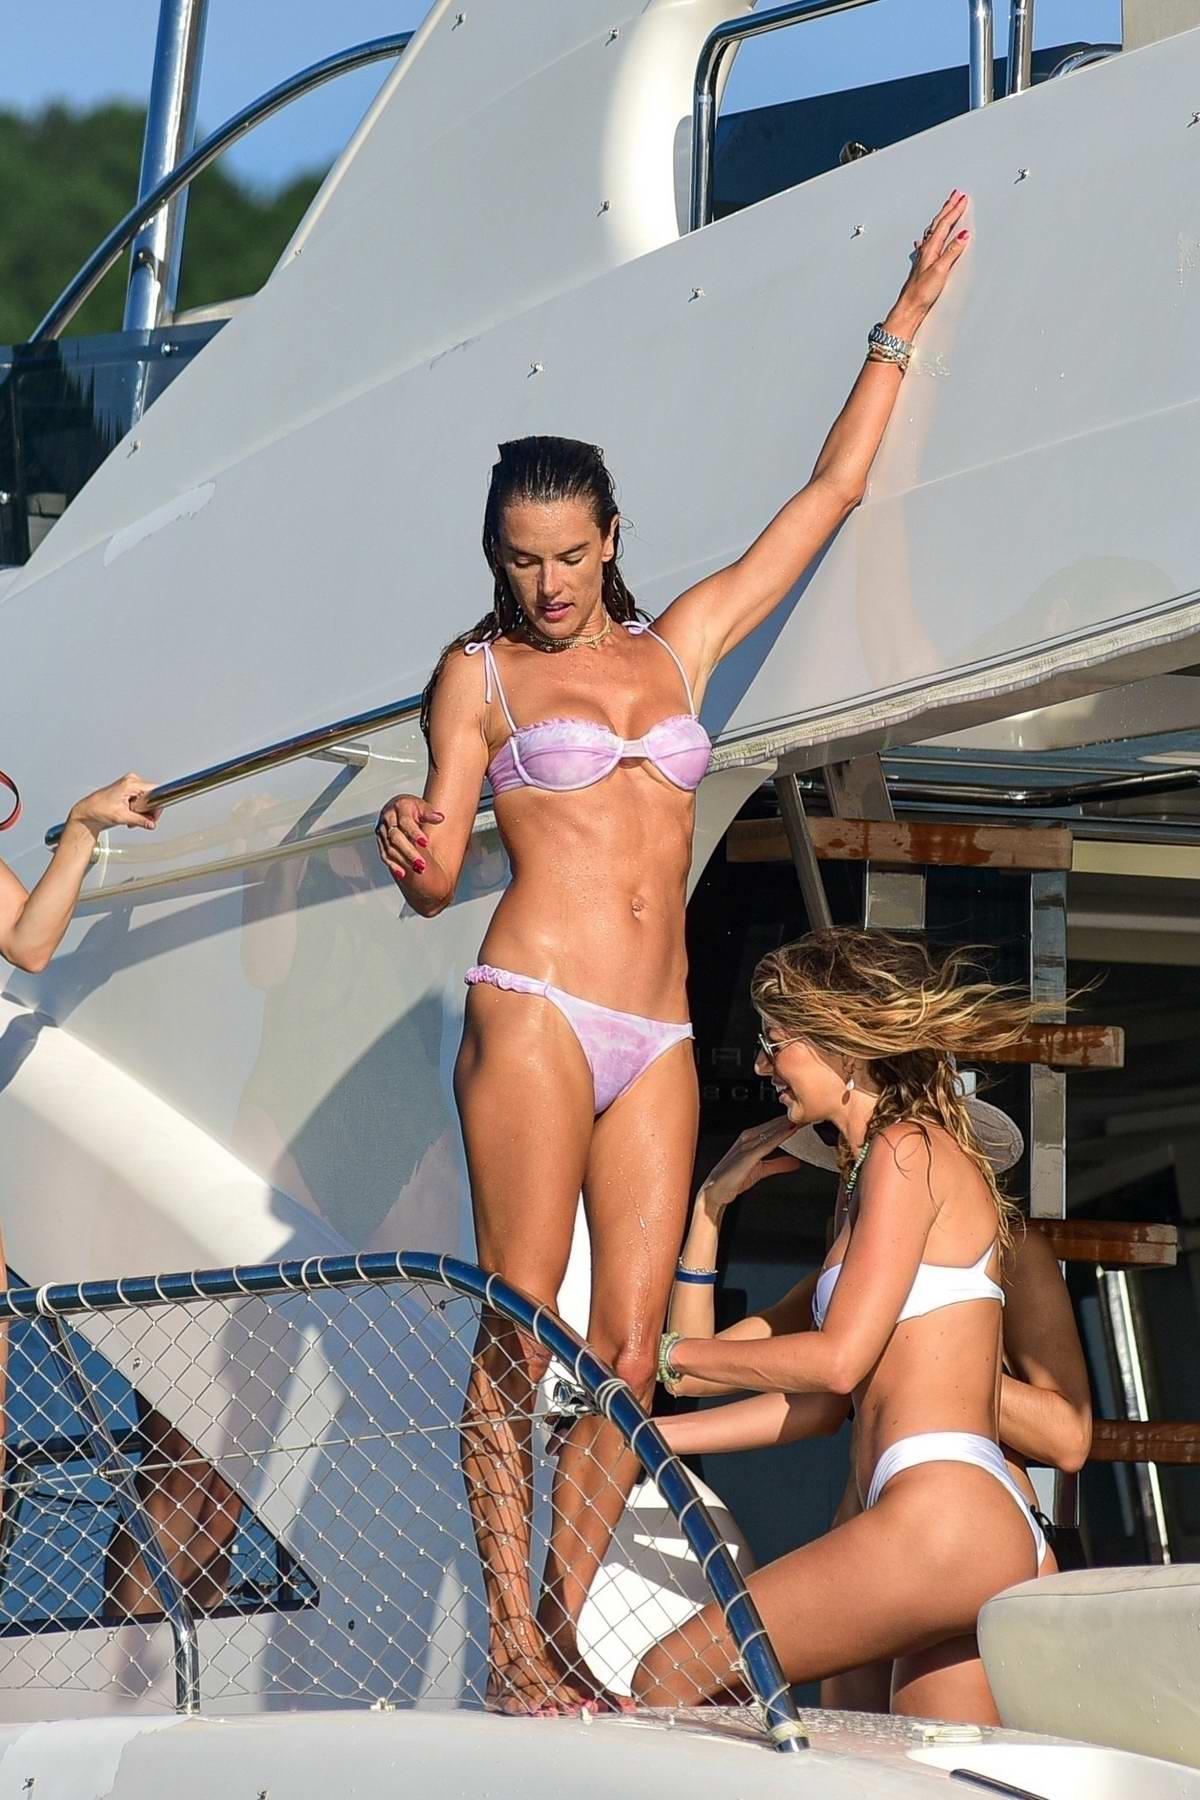 Alessandra Ambrosio showcases her stunning figure in a purple bikini while enjoying on a luxury yacht in Florianópolis, Brazil